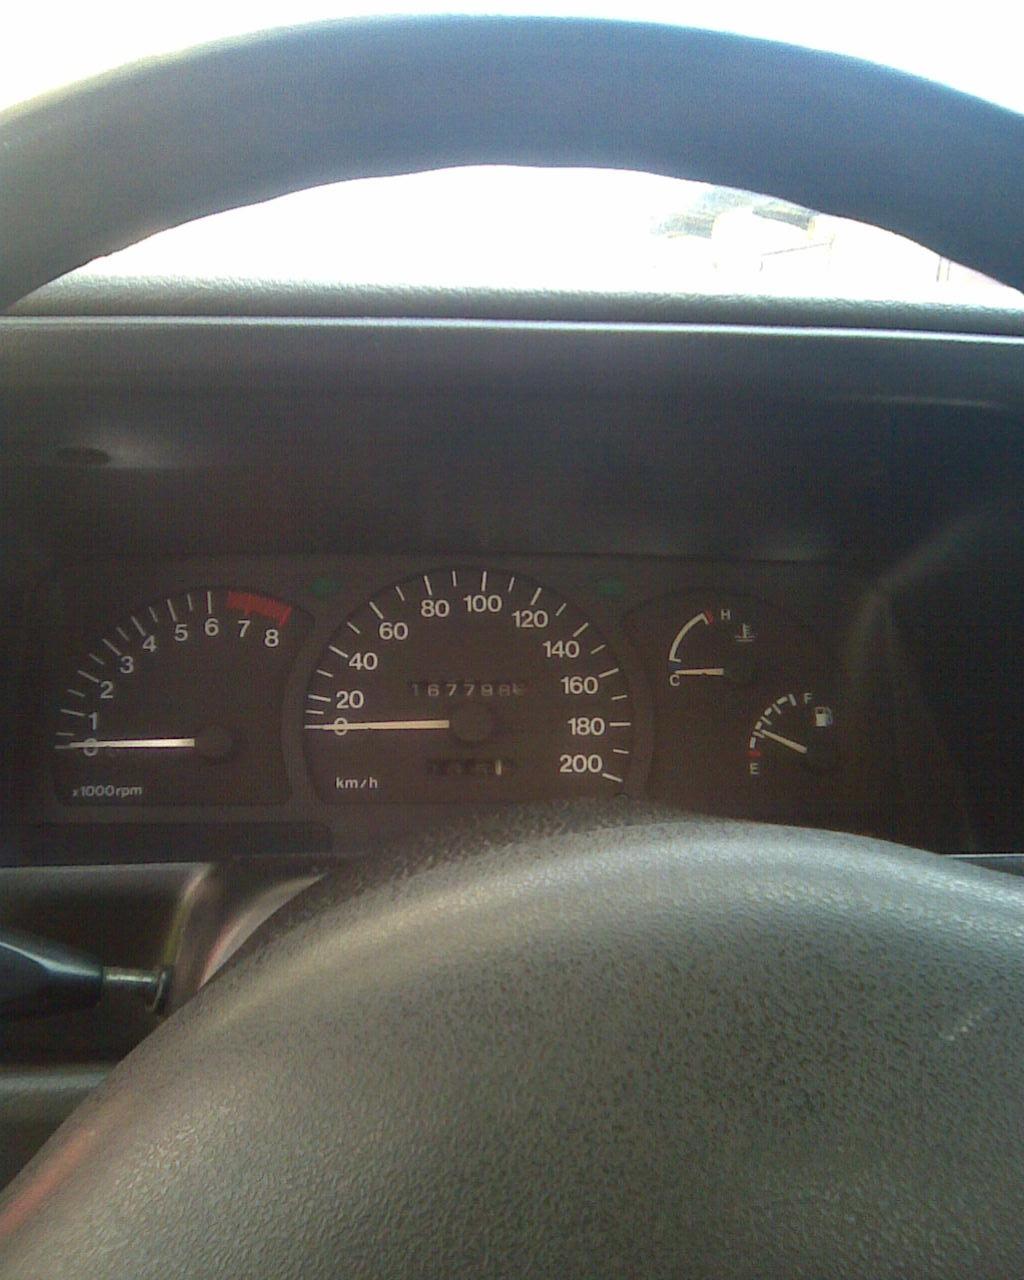 Daewoo cielo 1996 cu gpl